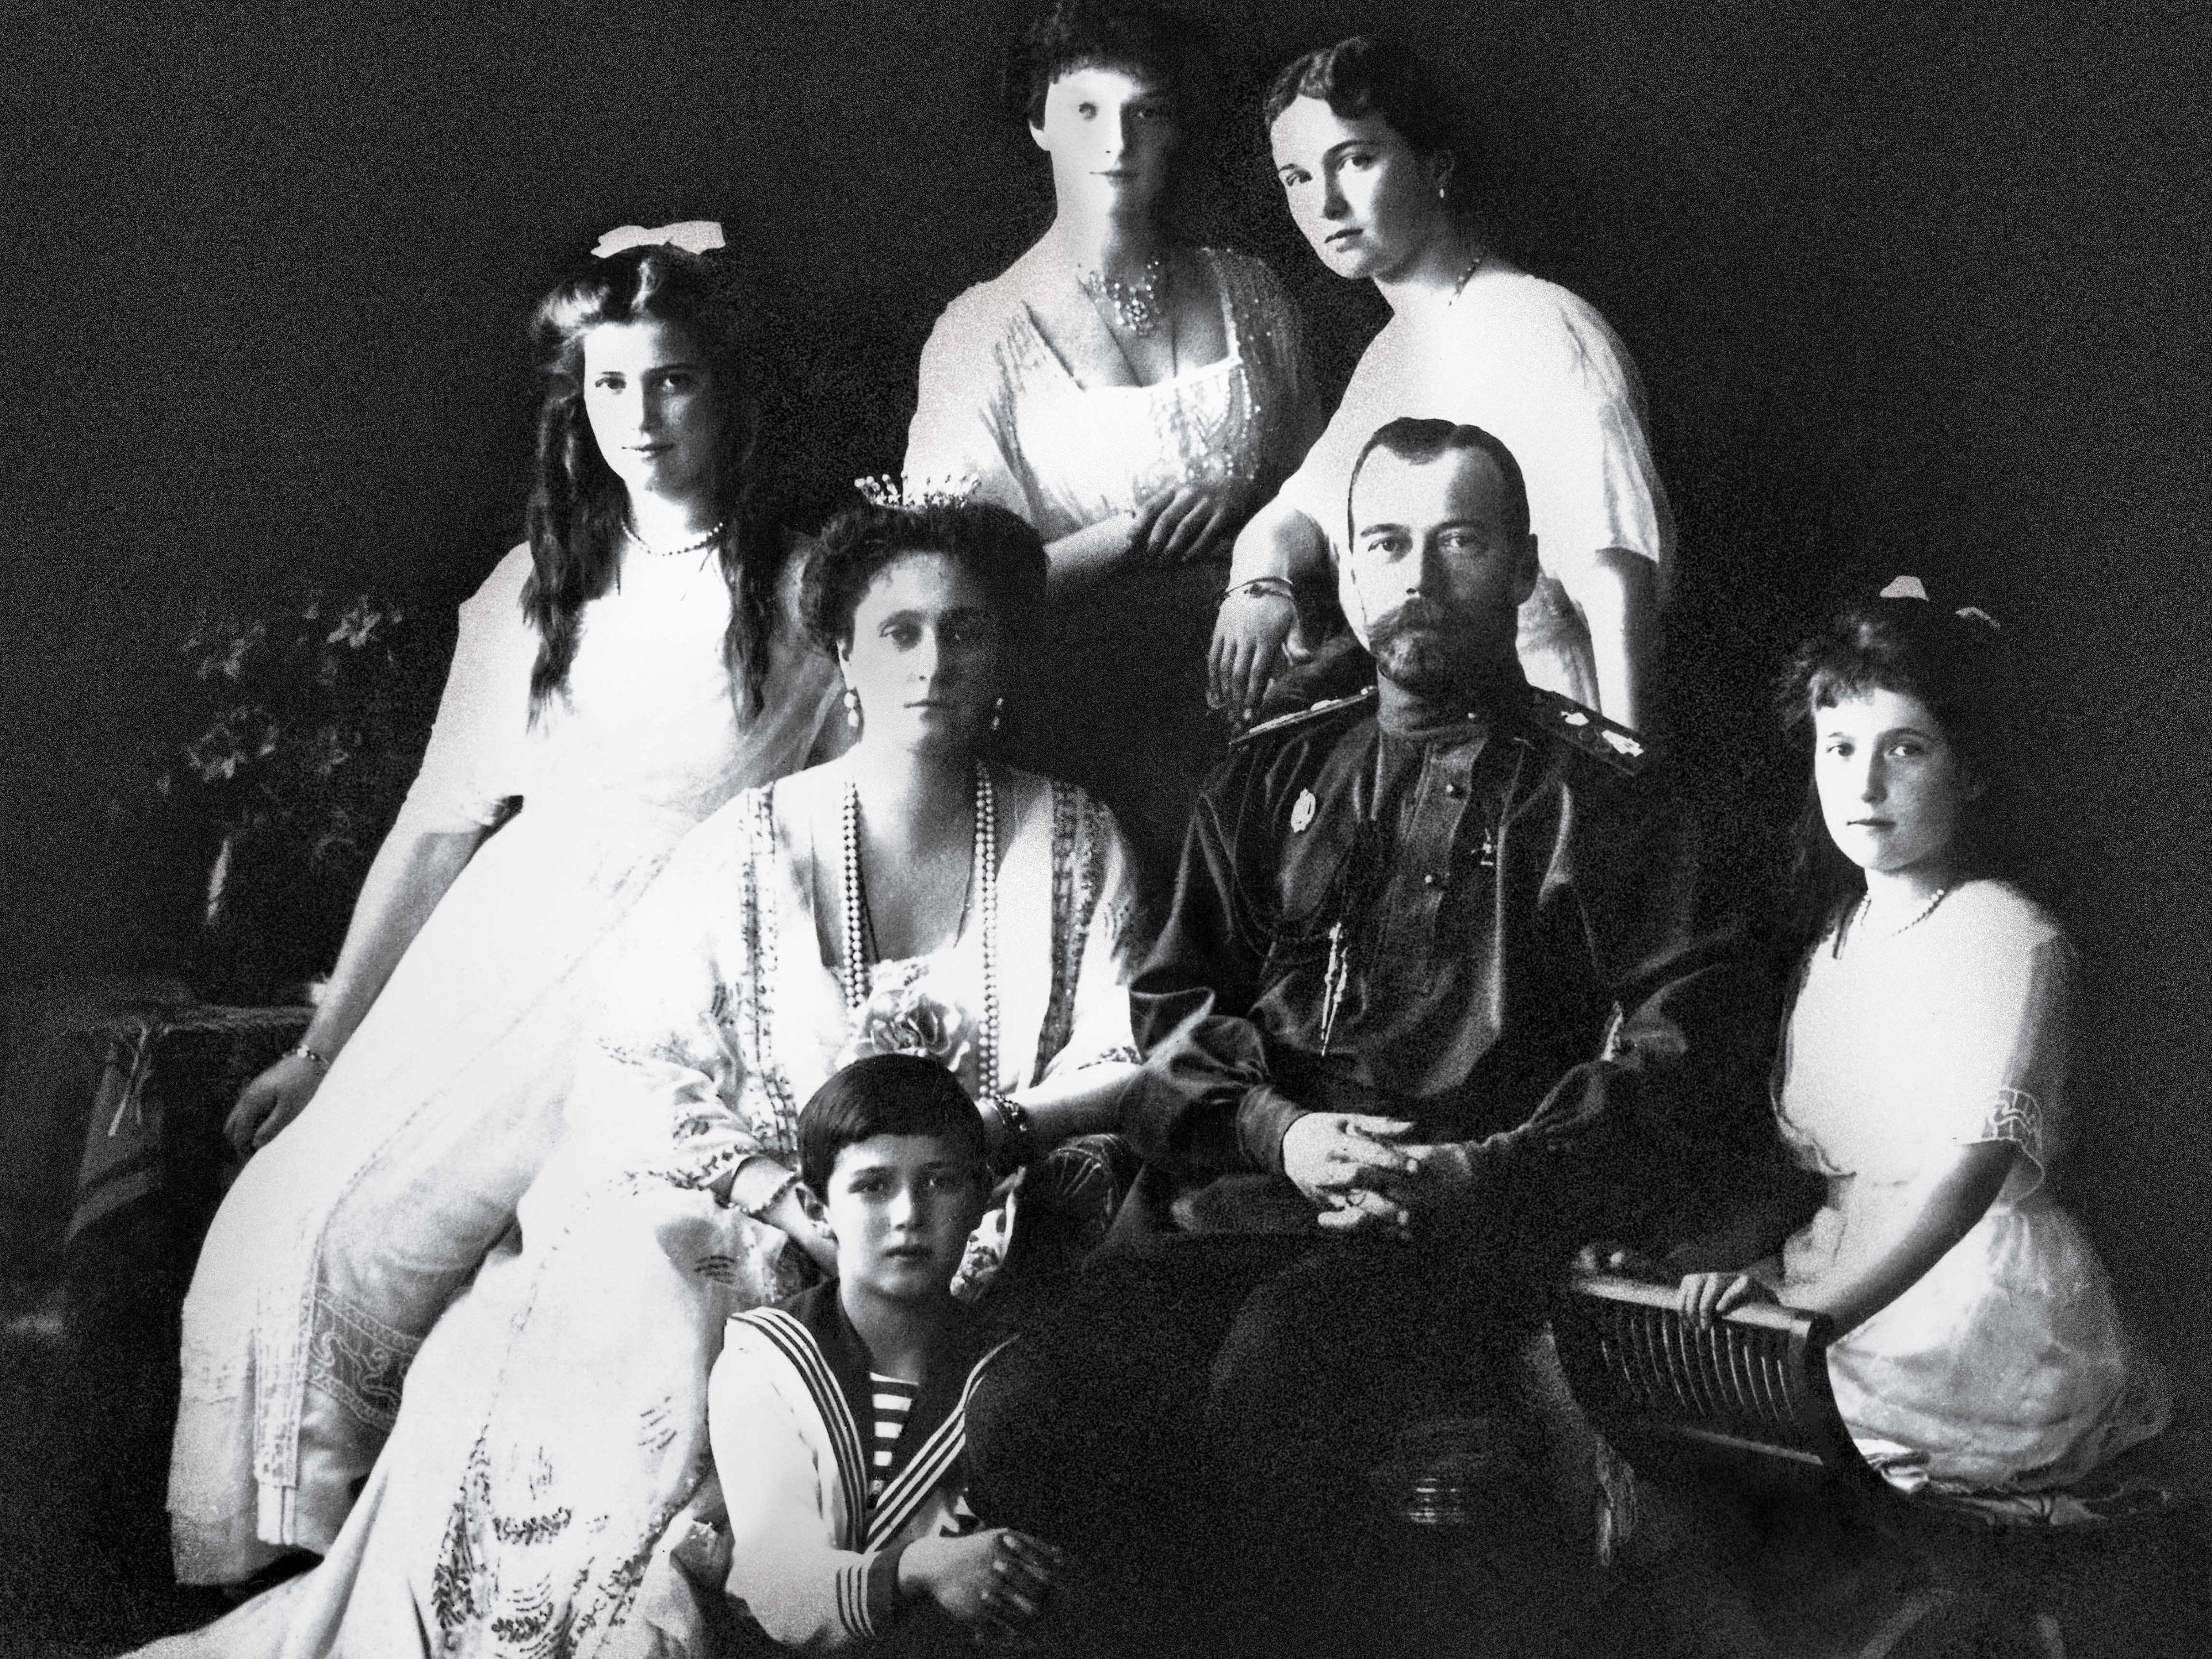 Photograph of Russian Imperial Family of Tsar Nicholas II Romanov Czar